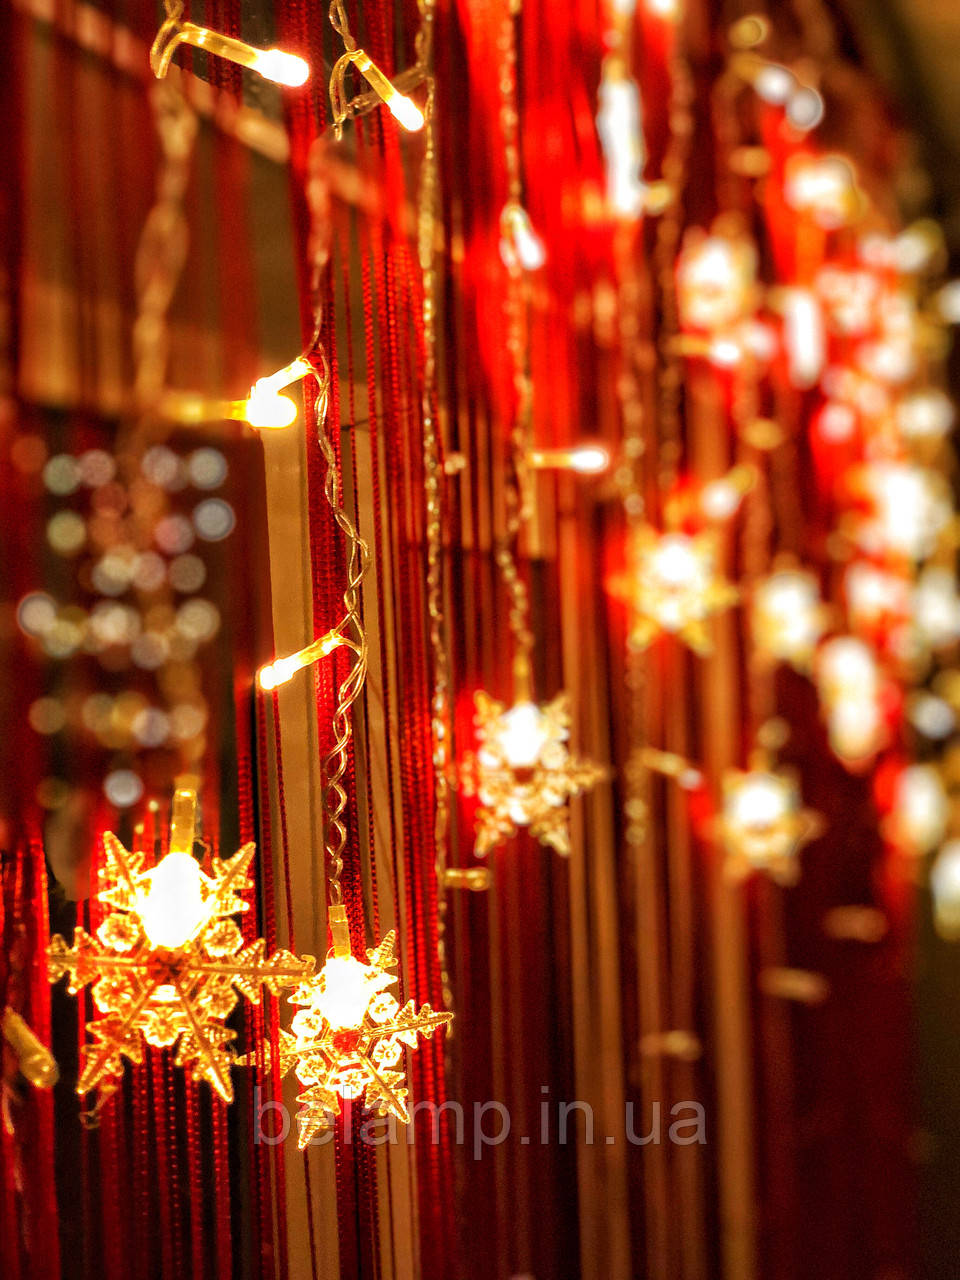 "Новогодняя гирлянда-бахрома на окно «Любимые снежинки"""